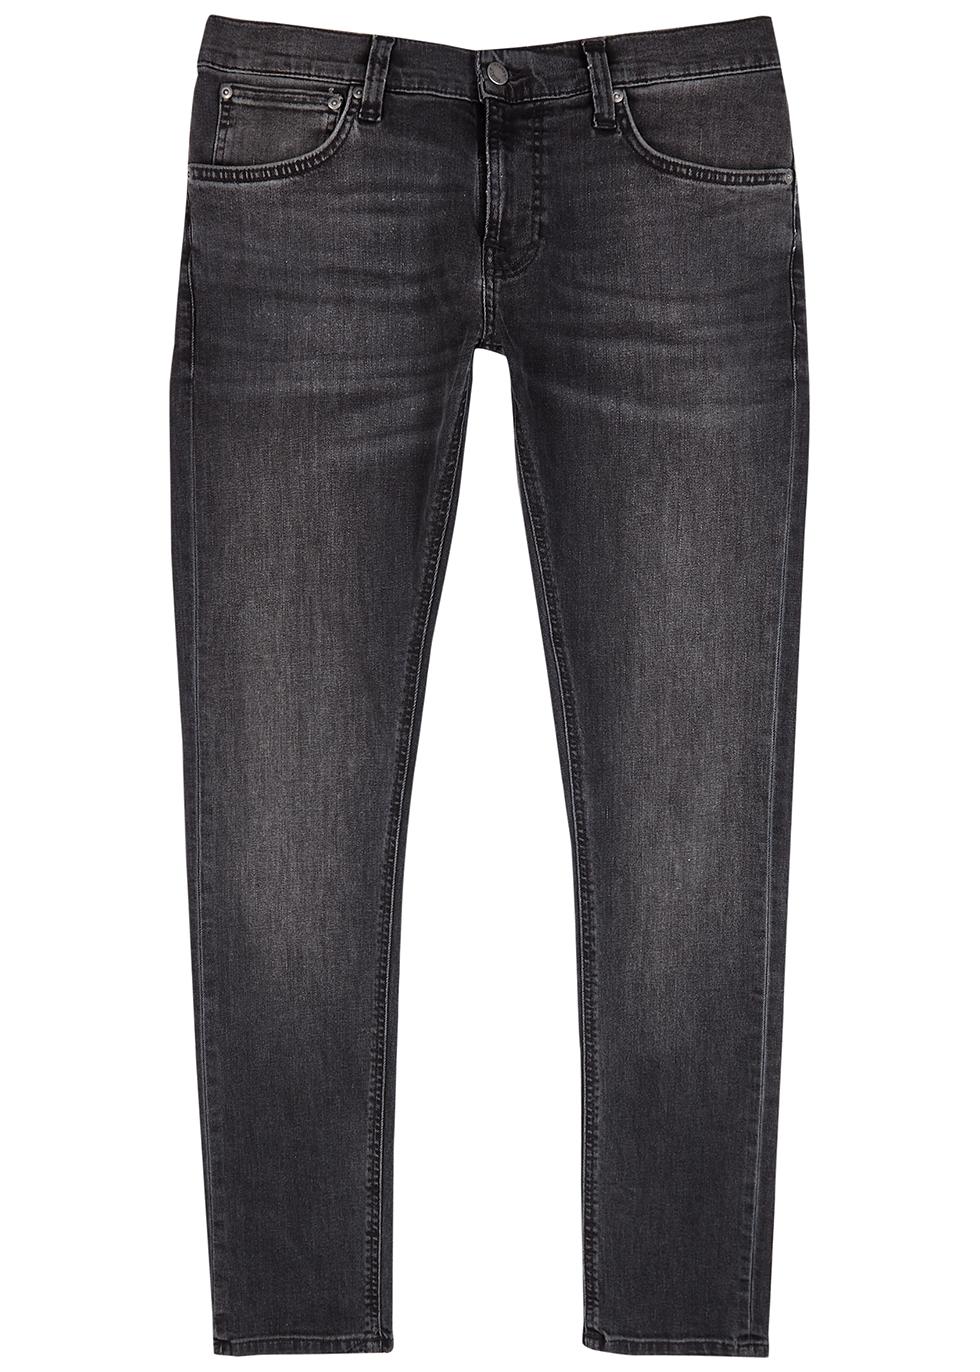 Tight Terry dark grey skinny jeans